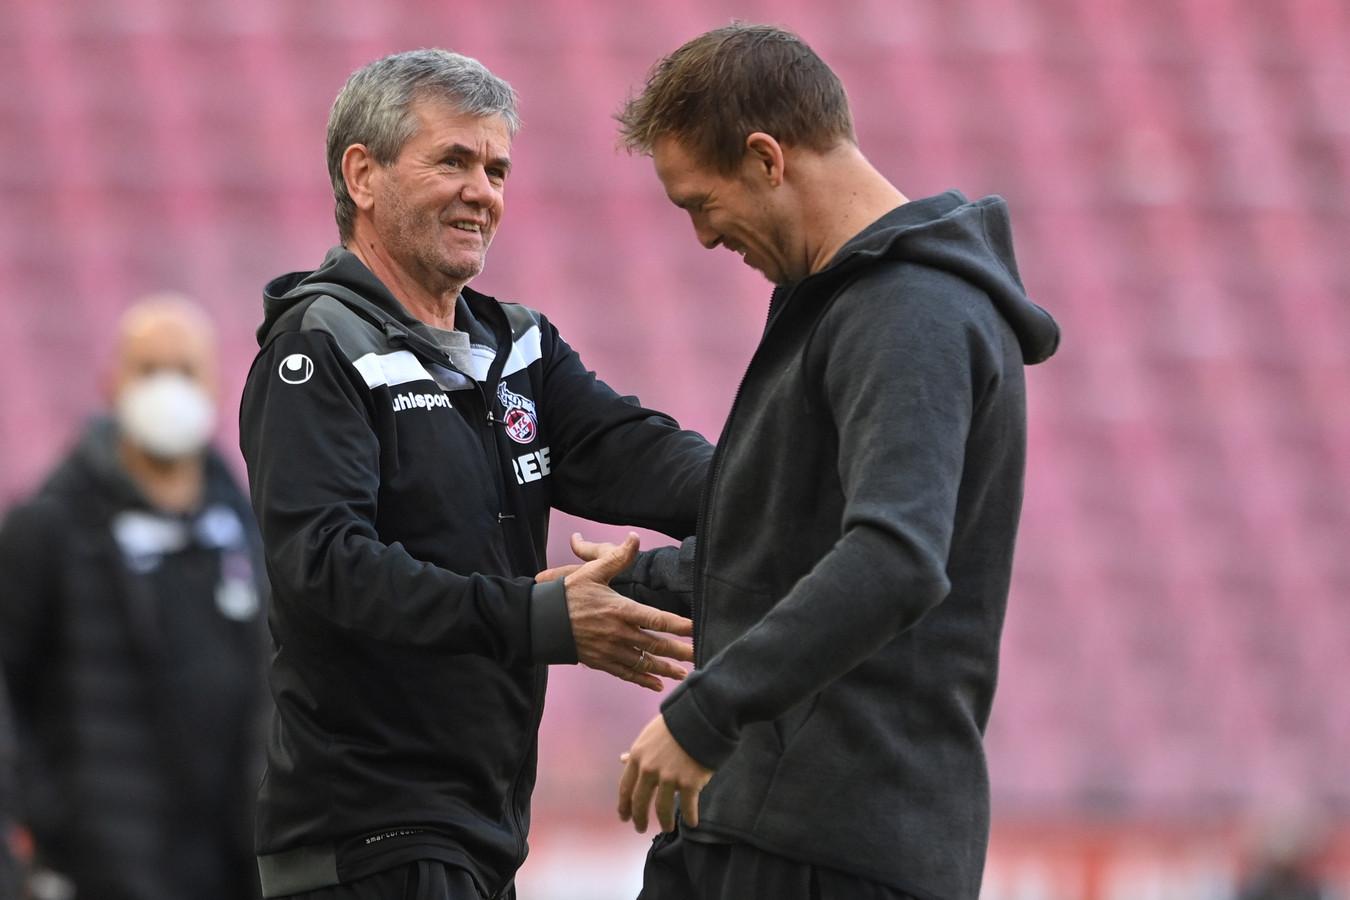 FC Köln-trainer Friedhelm Funkel (l) met RB Leipzig-trainer Julian Nagelsmann.